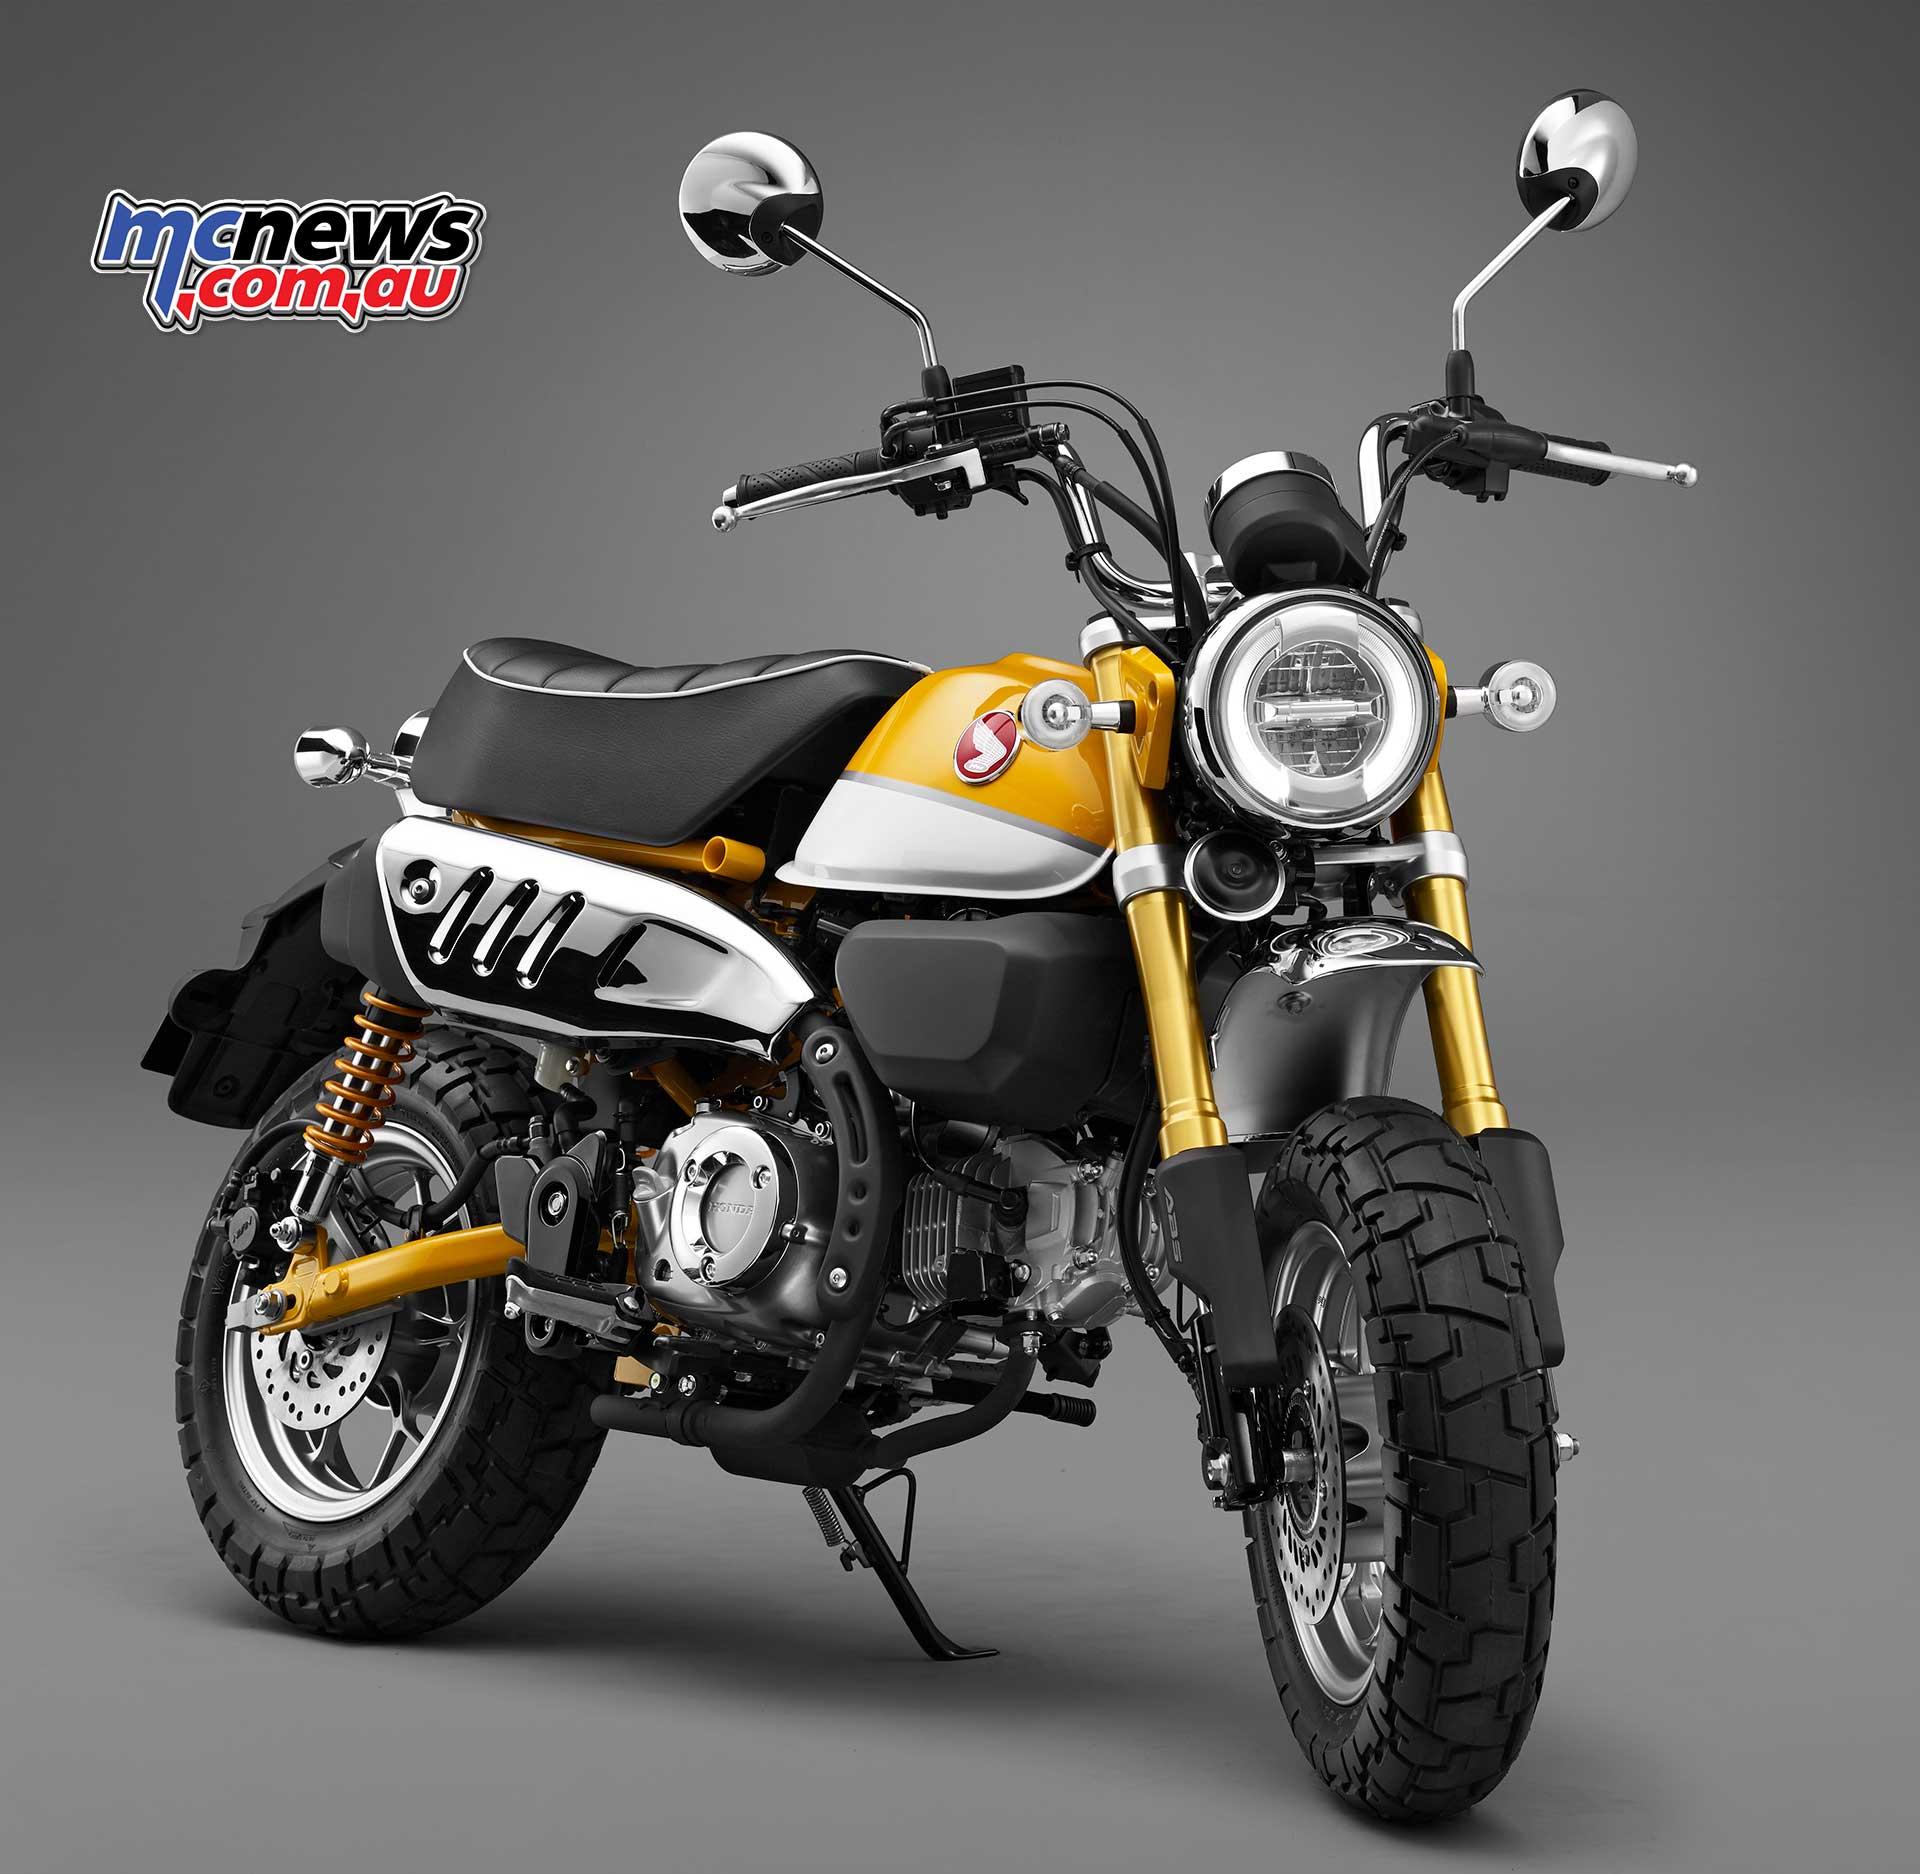 New Age Honda Monkey Bike For 2018 Mcnews Com Au